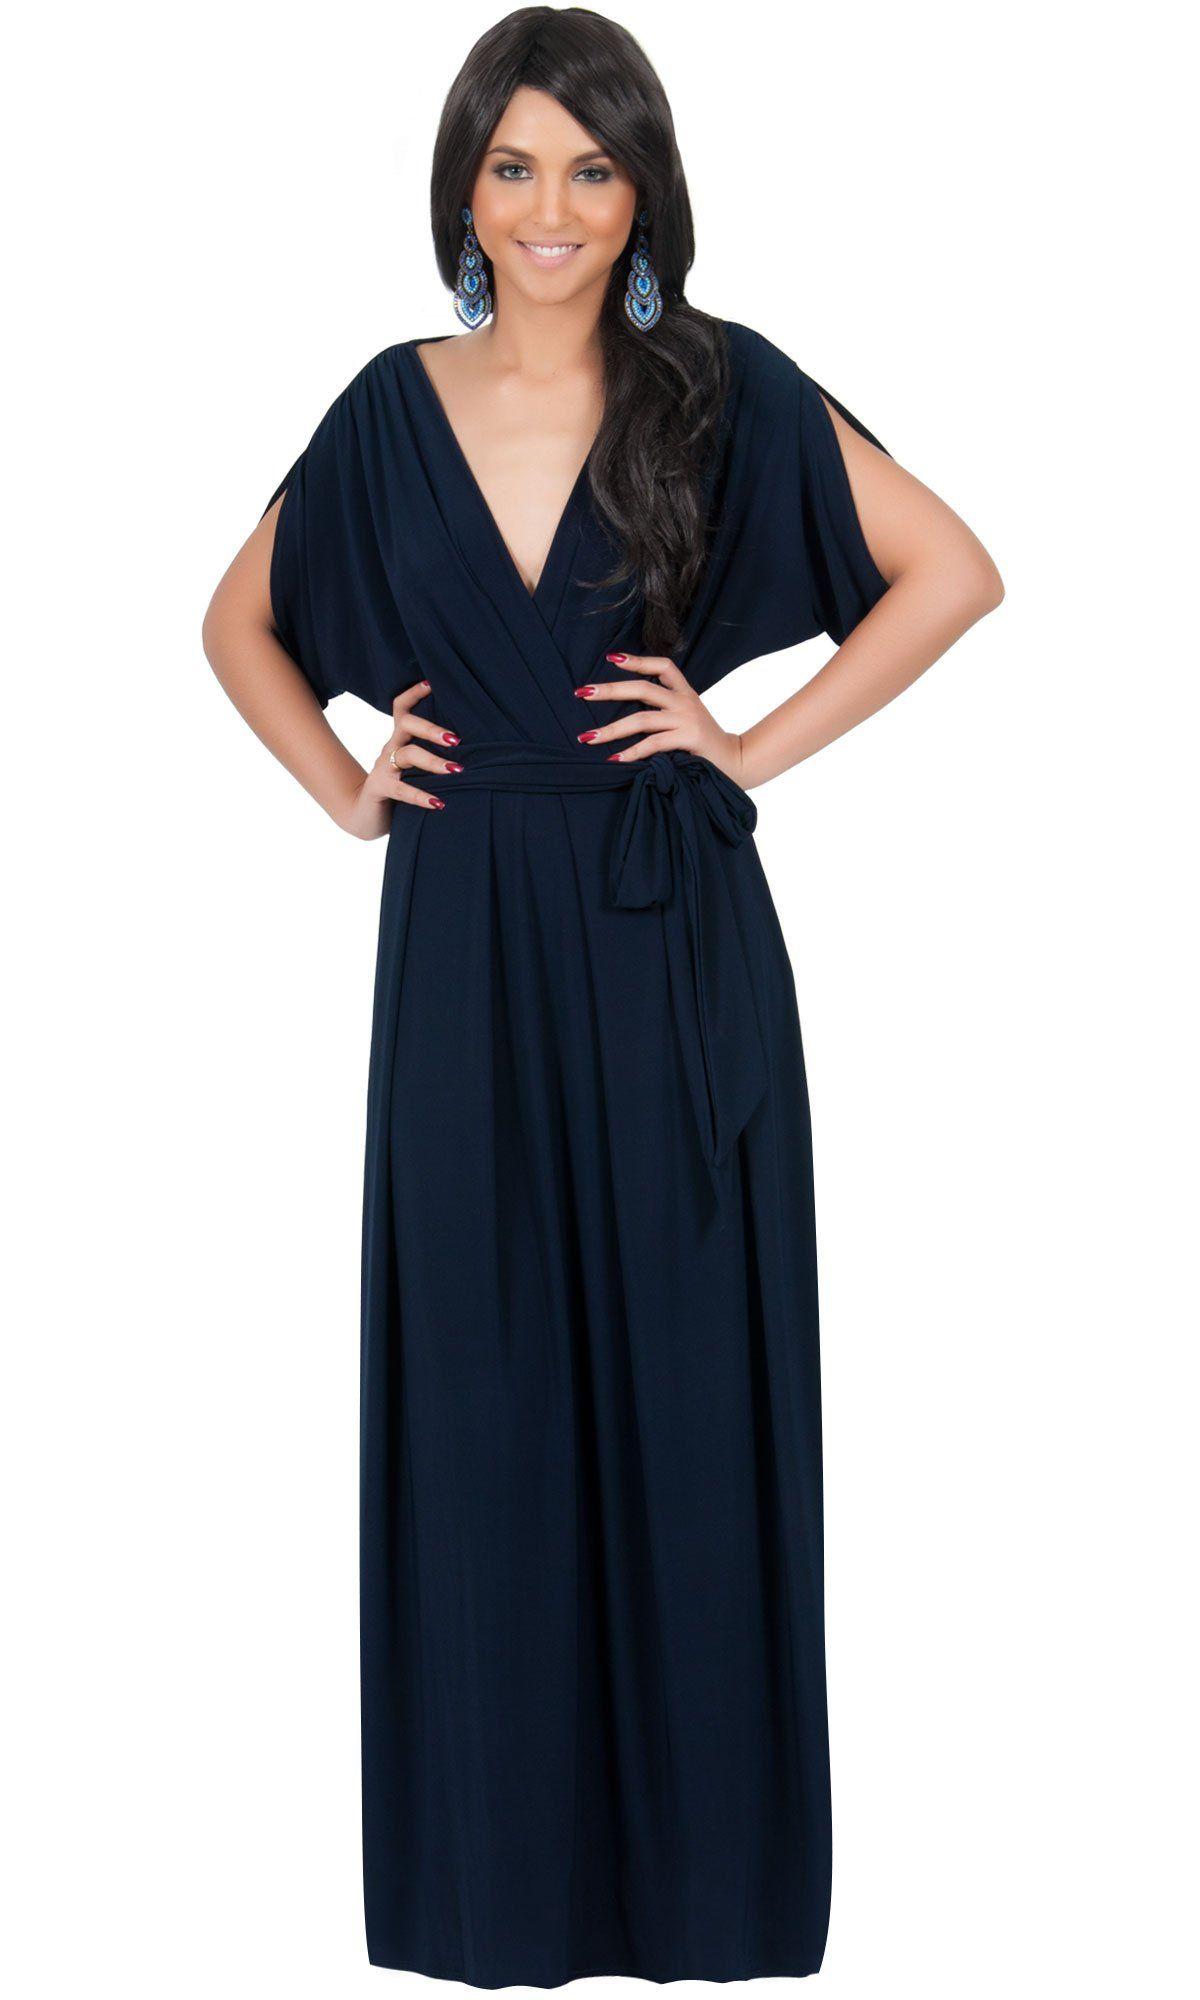 Dolman Sleeve Evening Dress